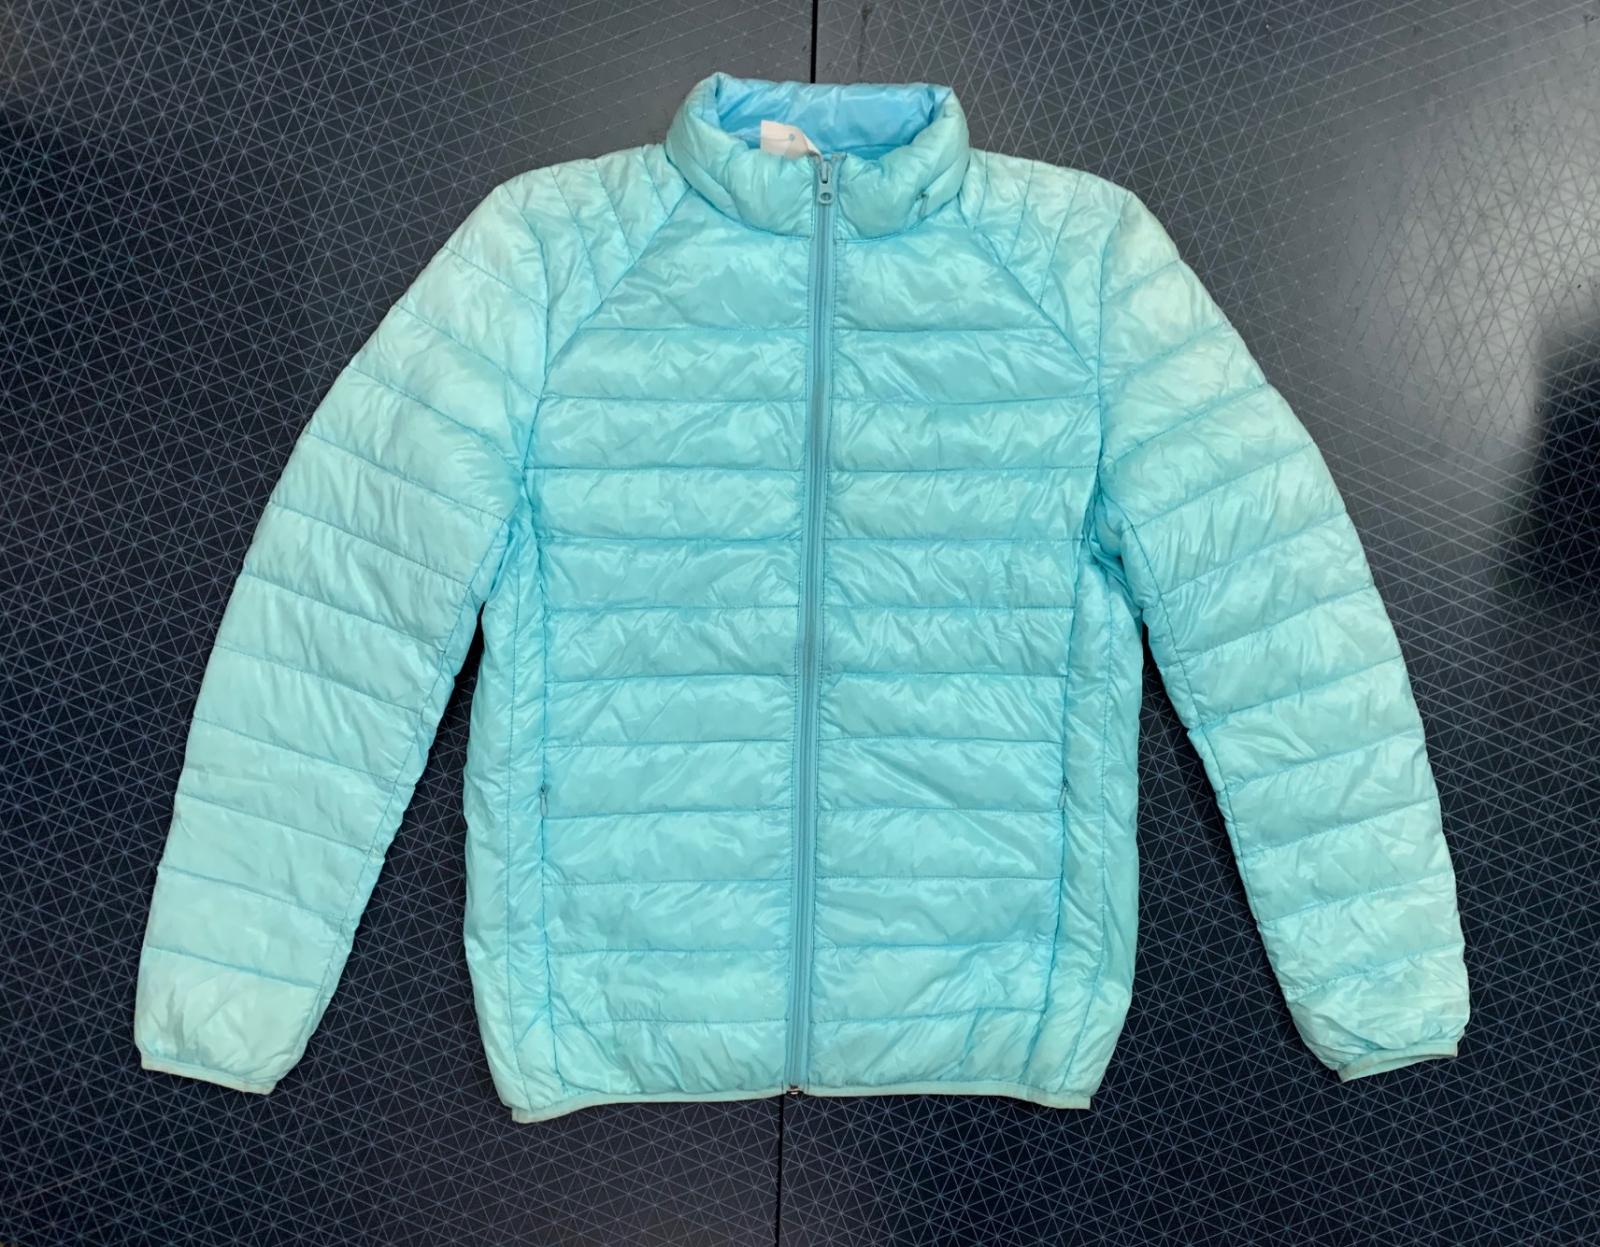 Броская мужская куртка от PDK SKAGEN